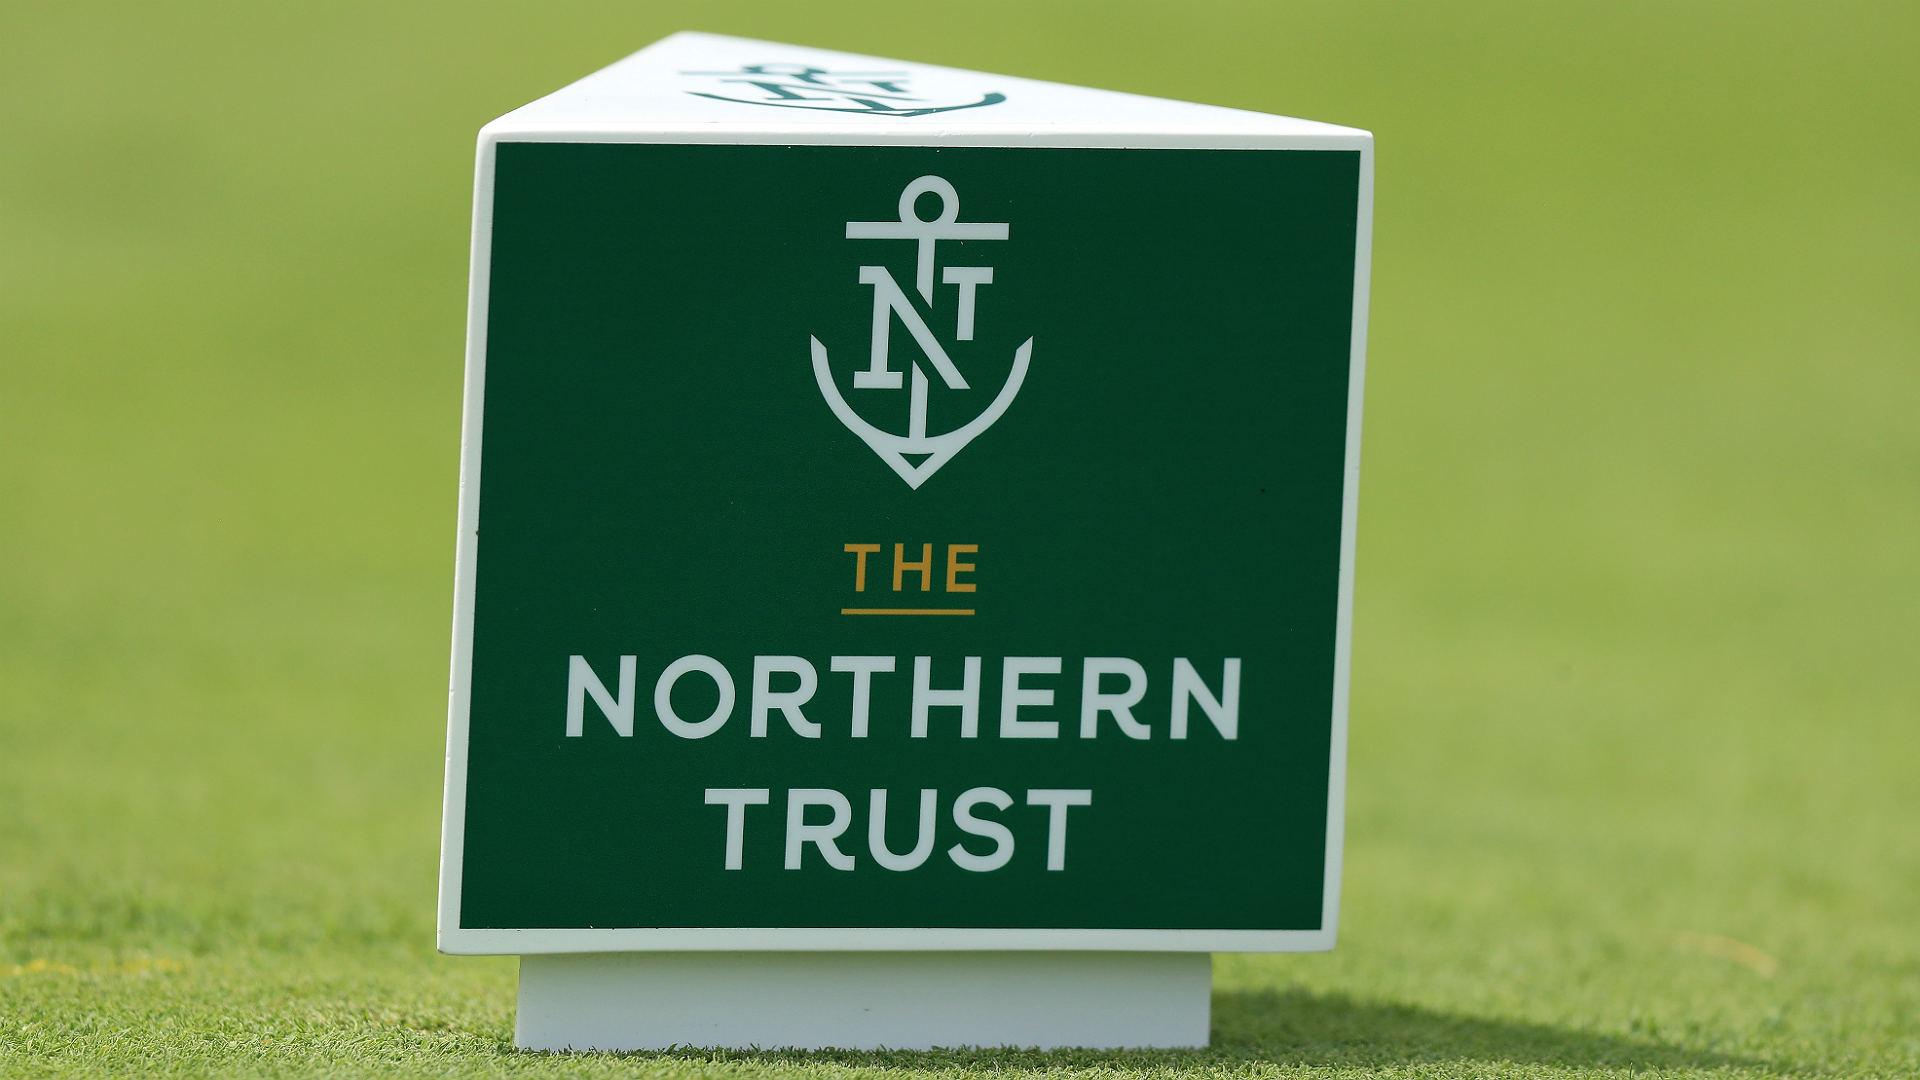 northern trust - DriverLayer Search Engine